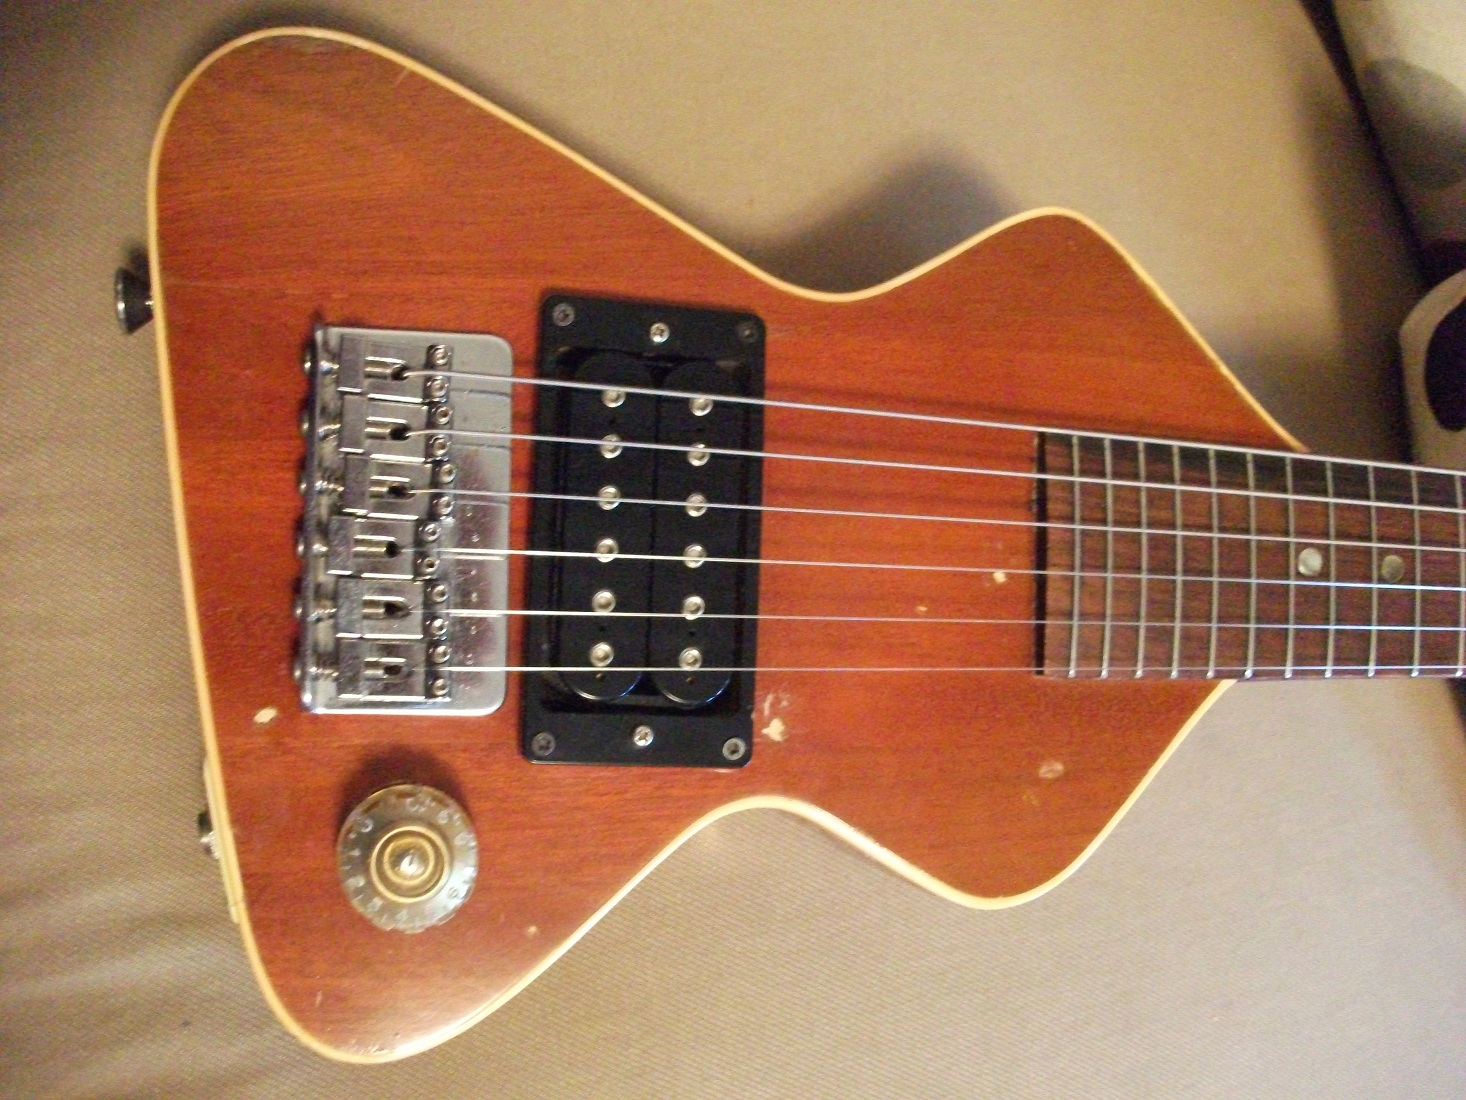 Marcel van Oort's Guitars and Equipment: Chiquita Travel Guitar